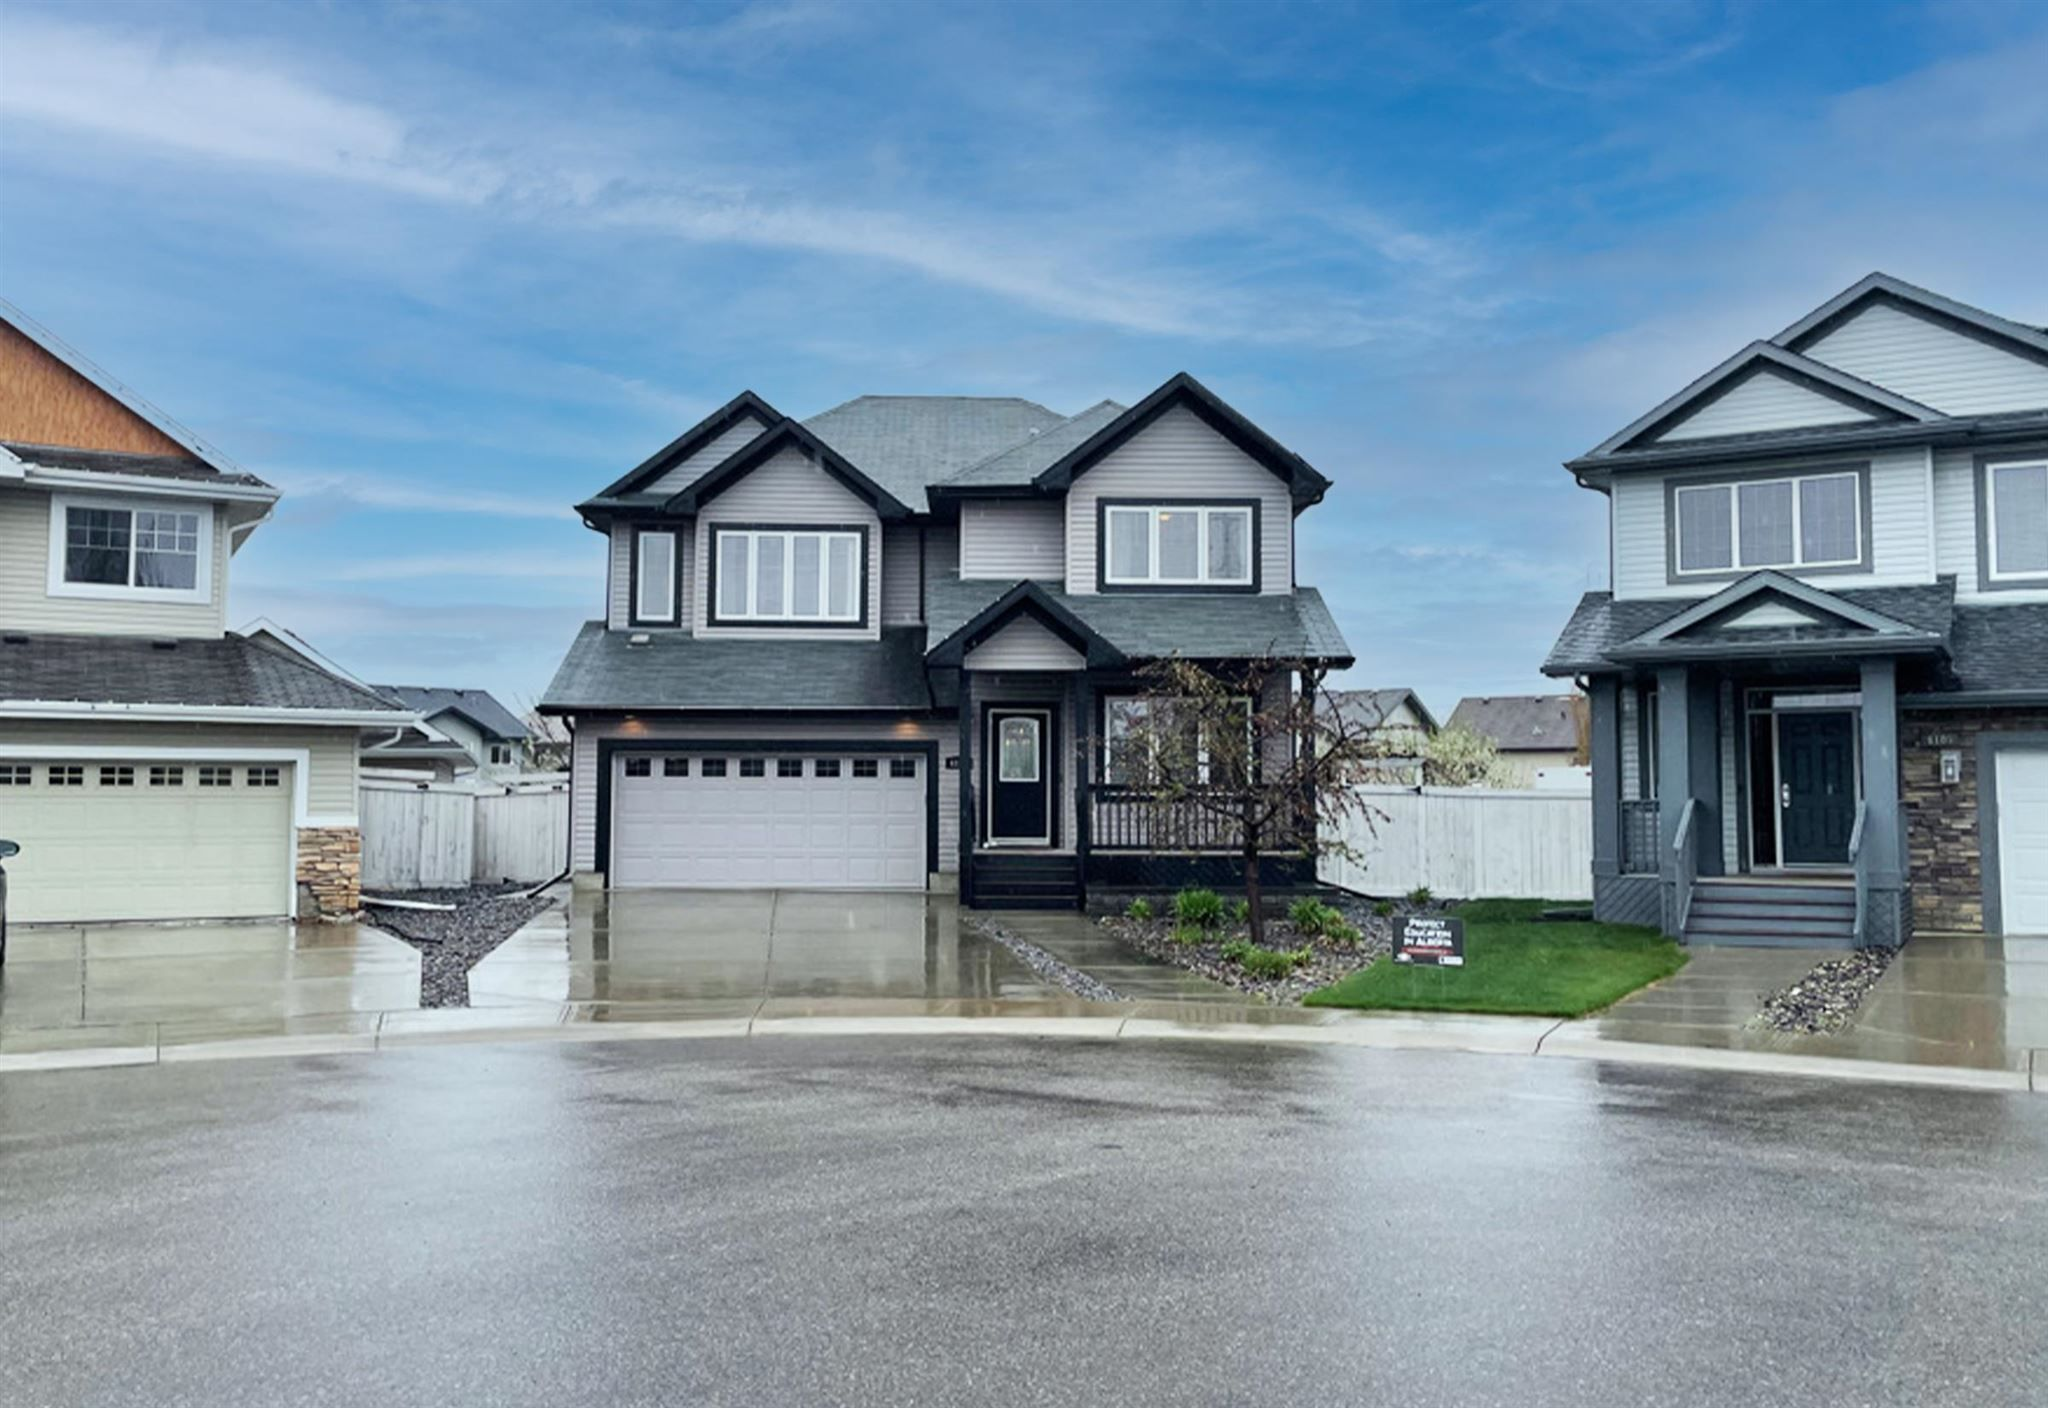 Main Photo: 6103 STINSON Way in Edmonton: Zone 14 House for sale : MLS®# E4245235